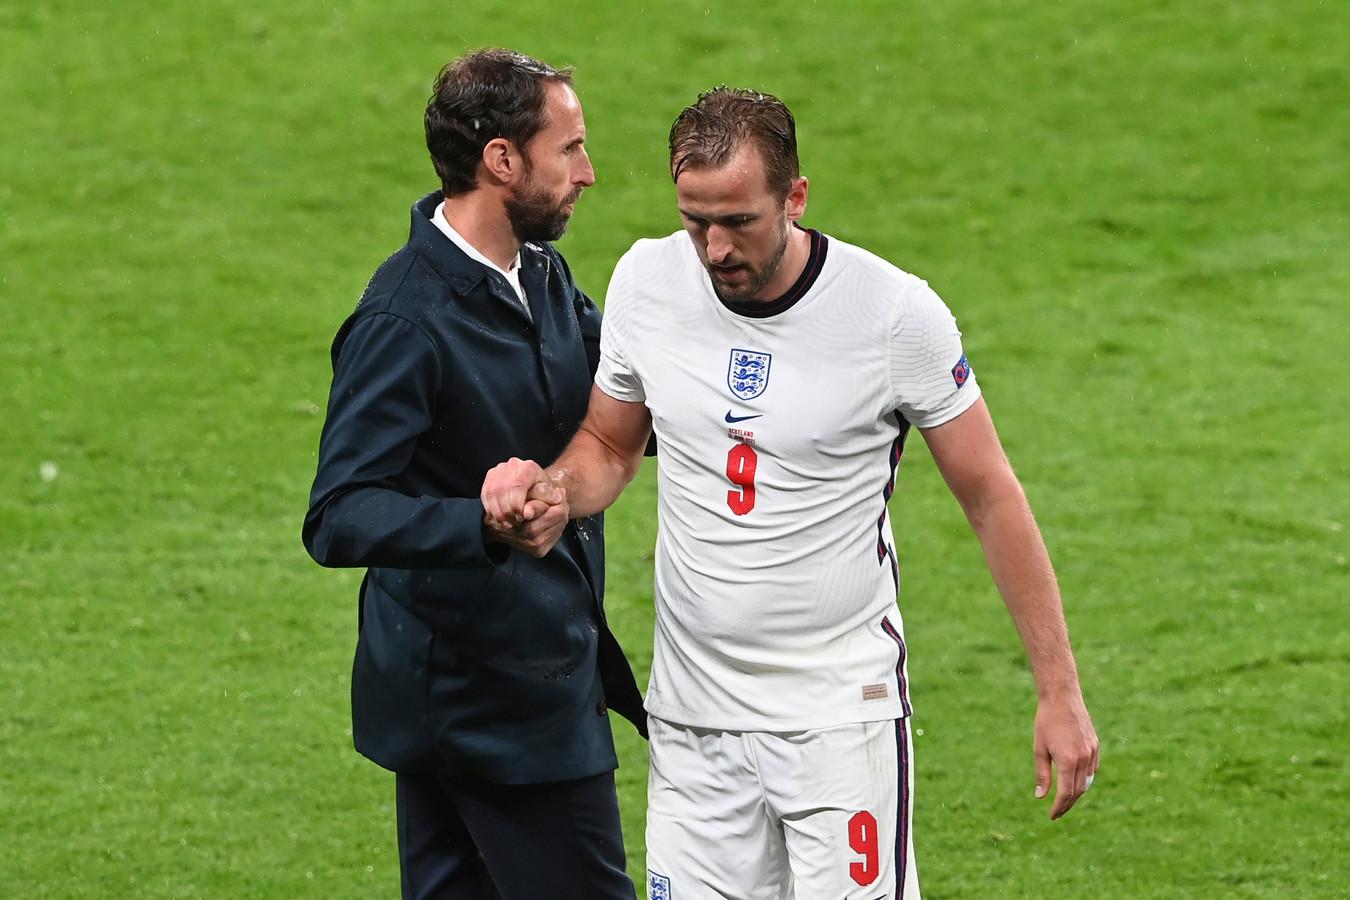 Engeland - Schotland, 74ste minuut. Net als tegen Kroatië wisselt bondscoach Gareth Southgate zijn aanvoerder.